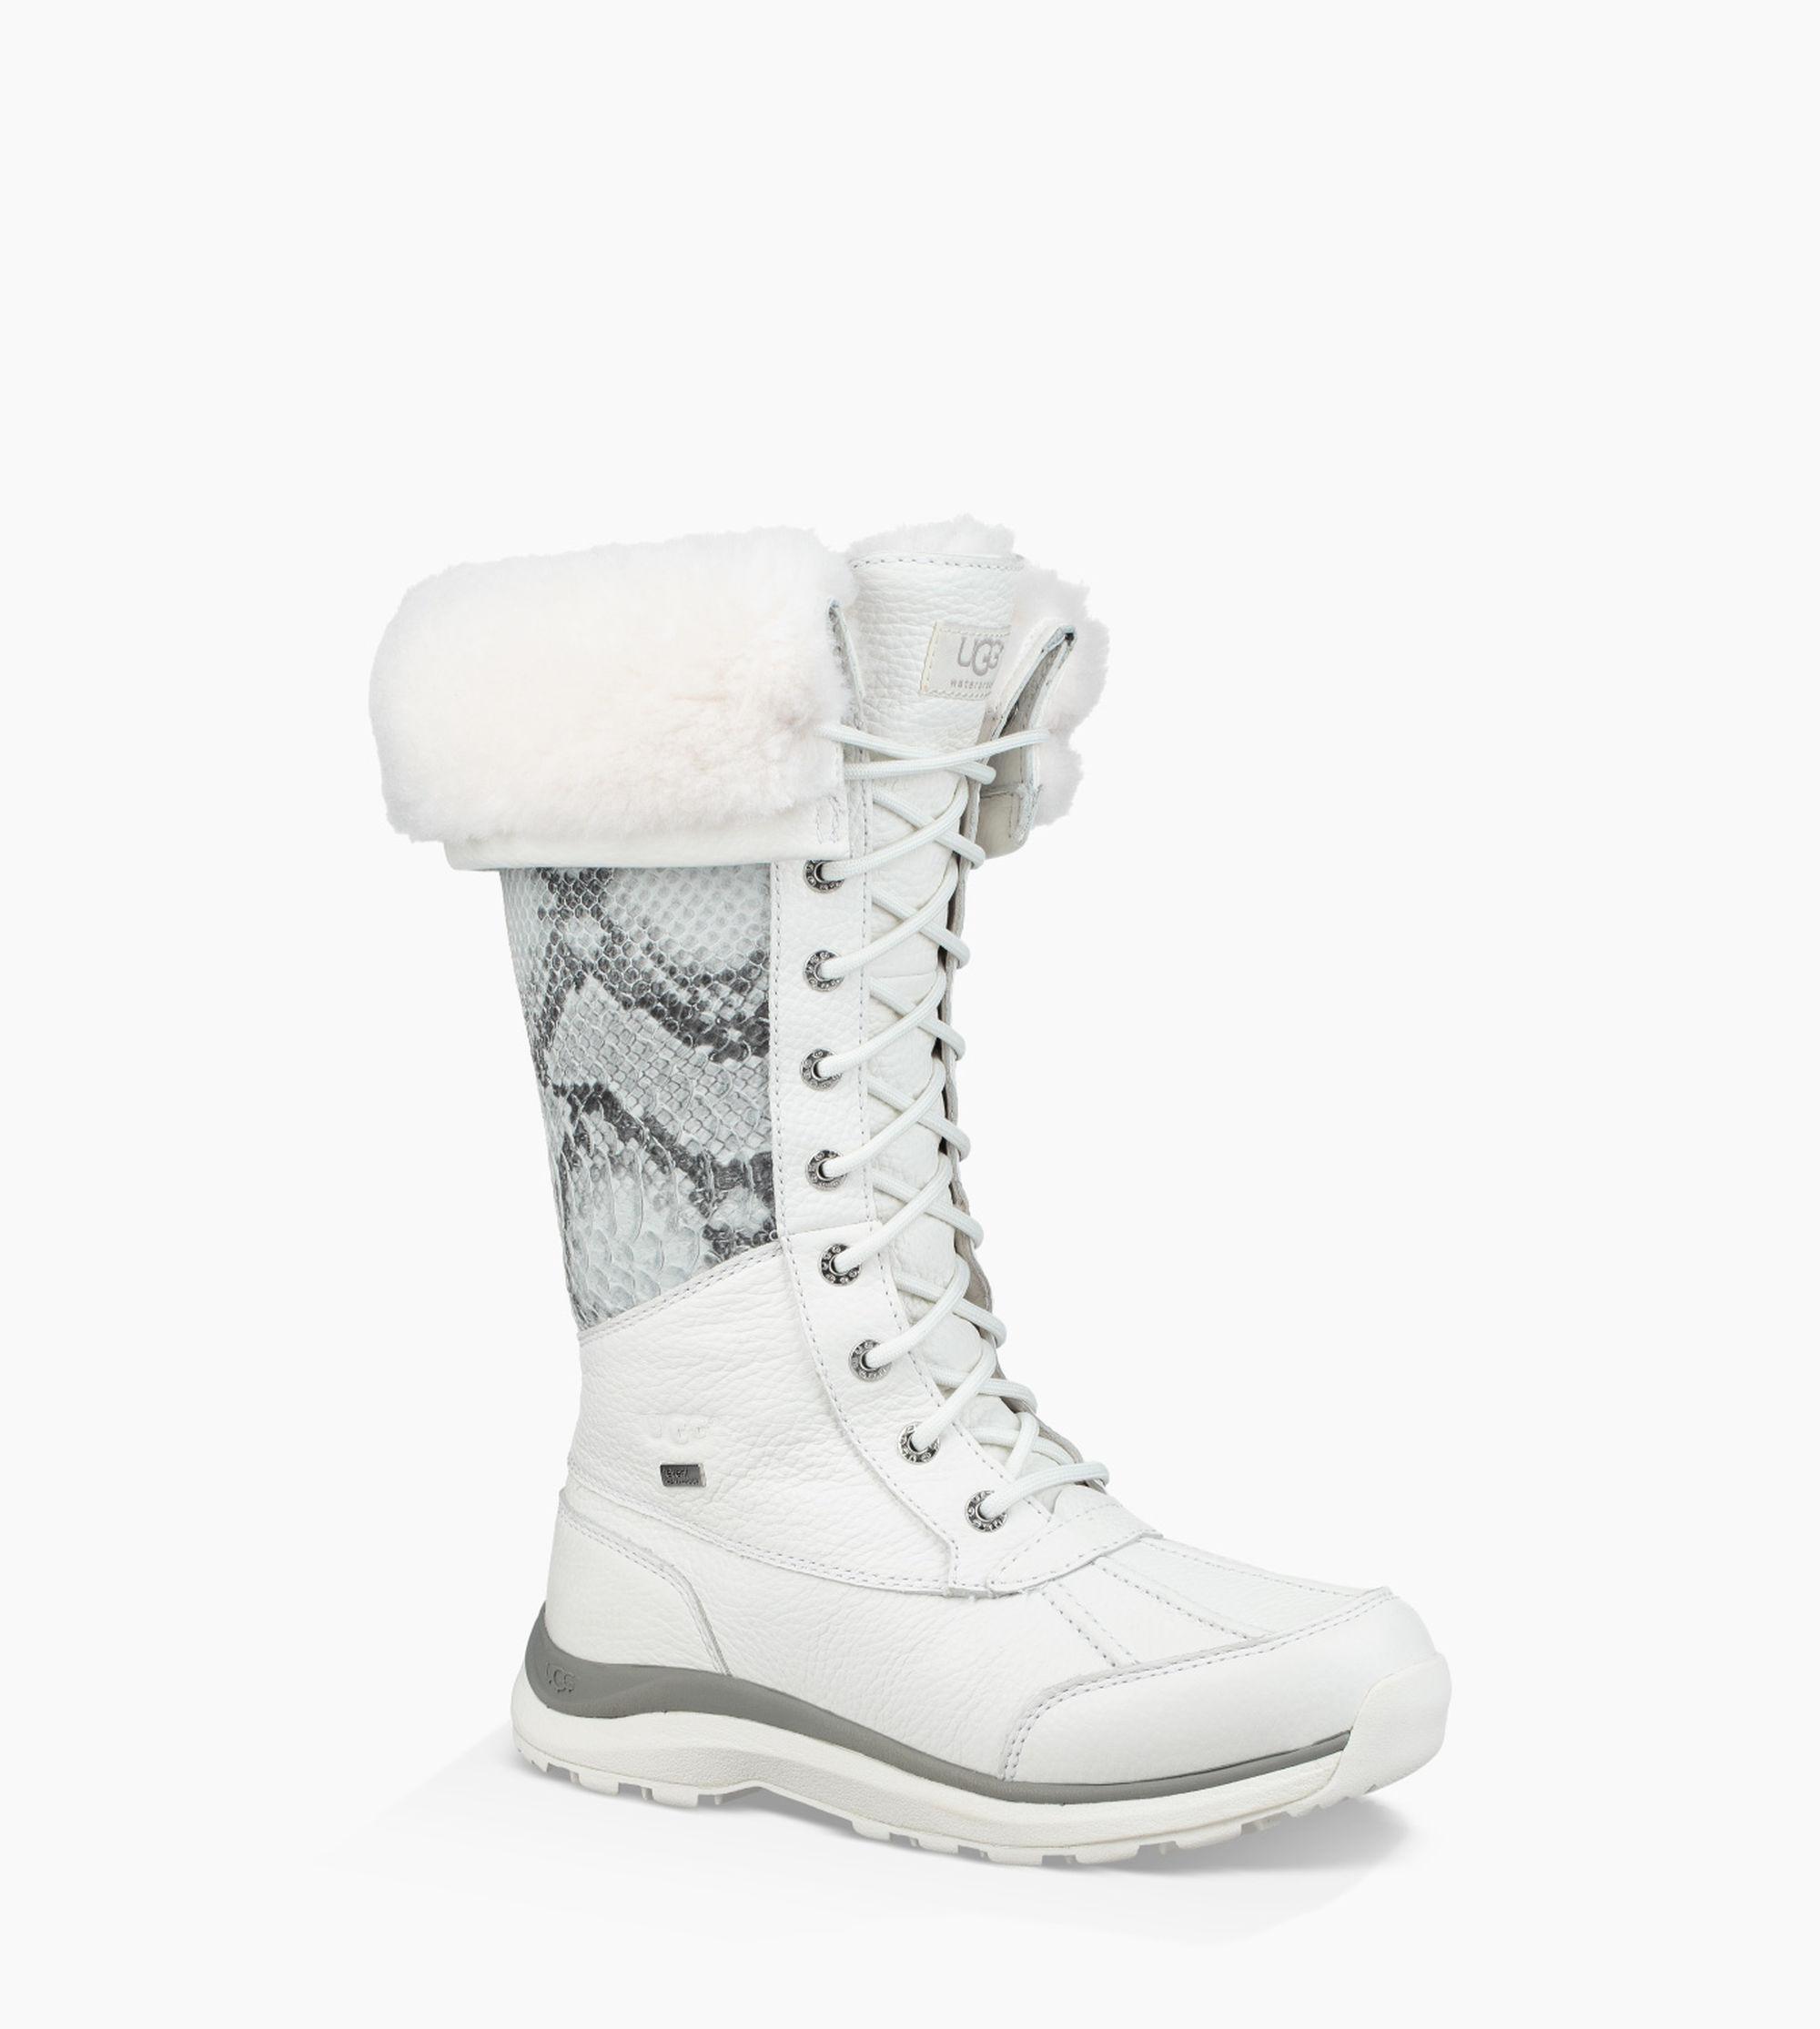 345a511b18e Ugg White Women's Adirondack Tall Iii Snake